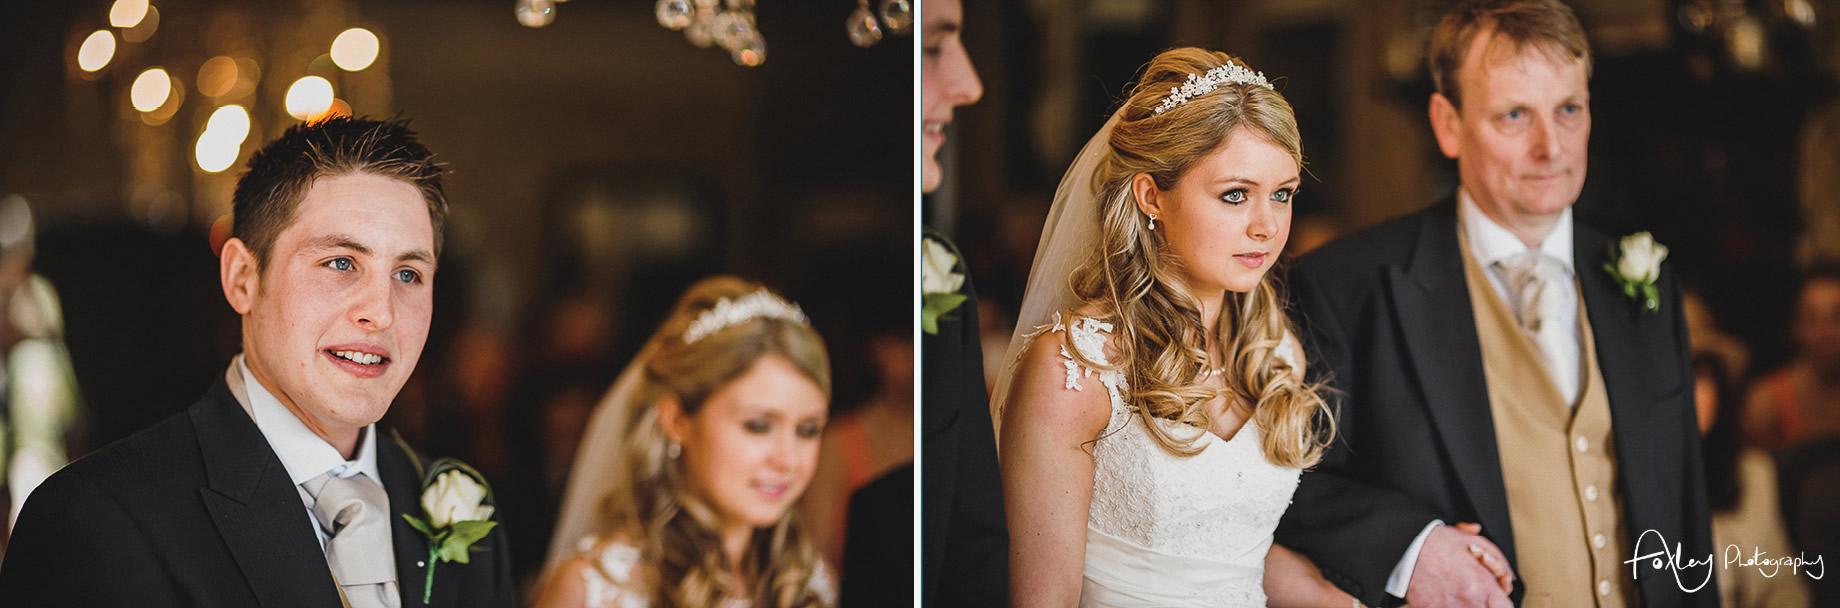 Gemma and Lewis' Wedding at Mitton Hall 073